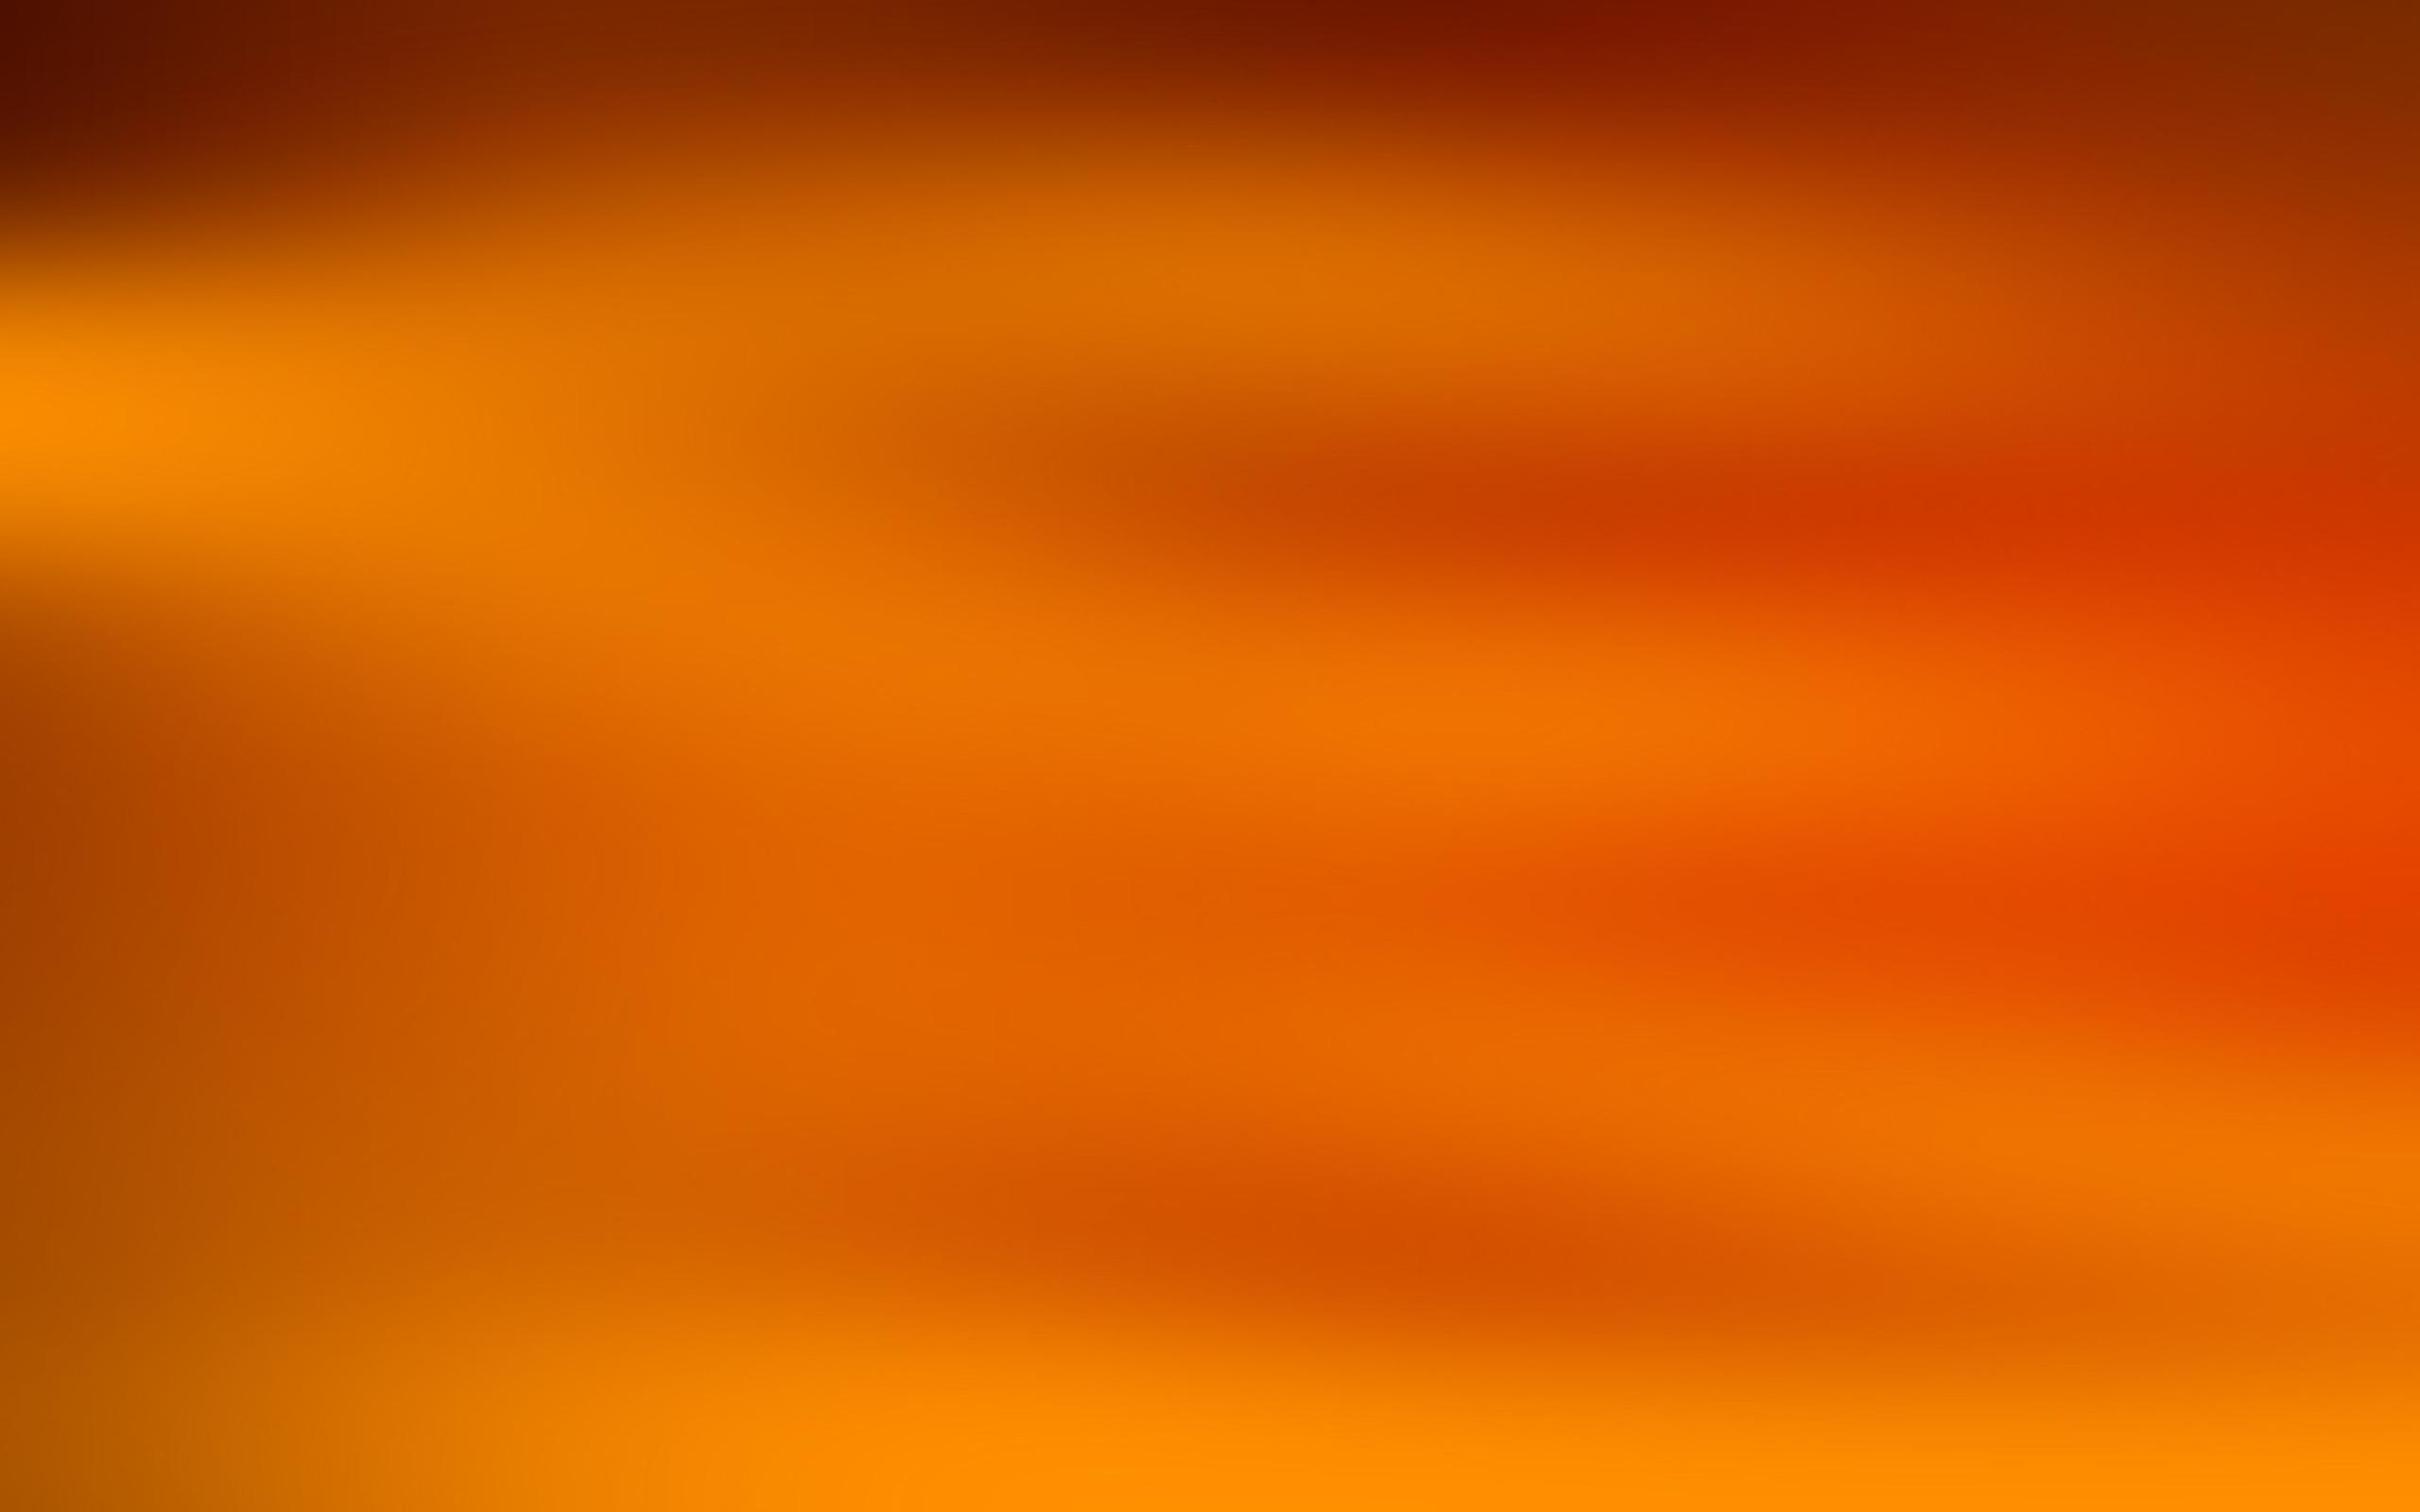 Orange Surface Wallpaper Orange Colour Background Hd Hd